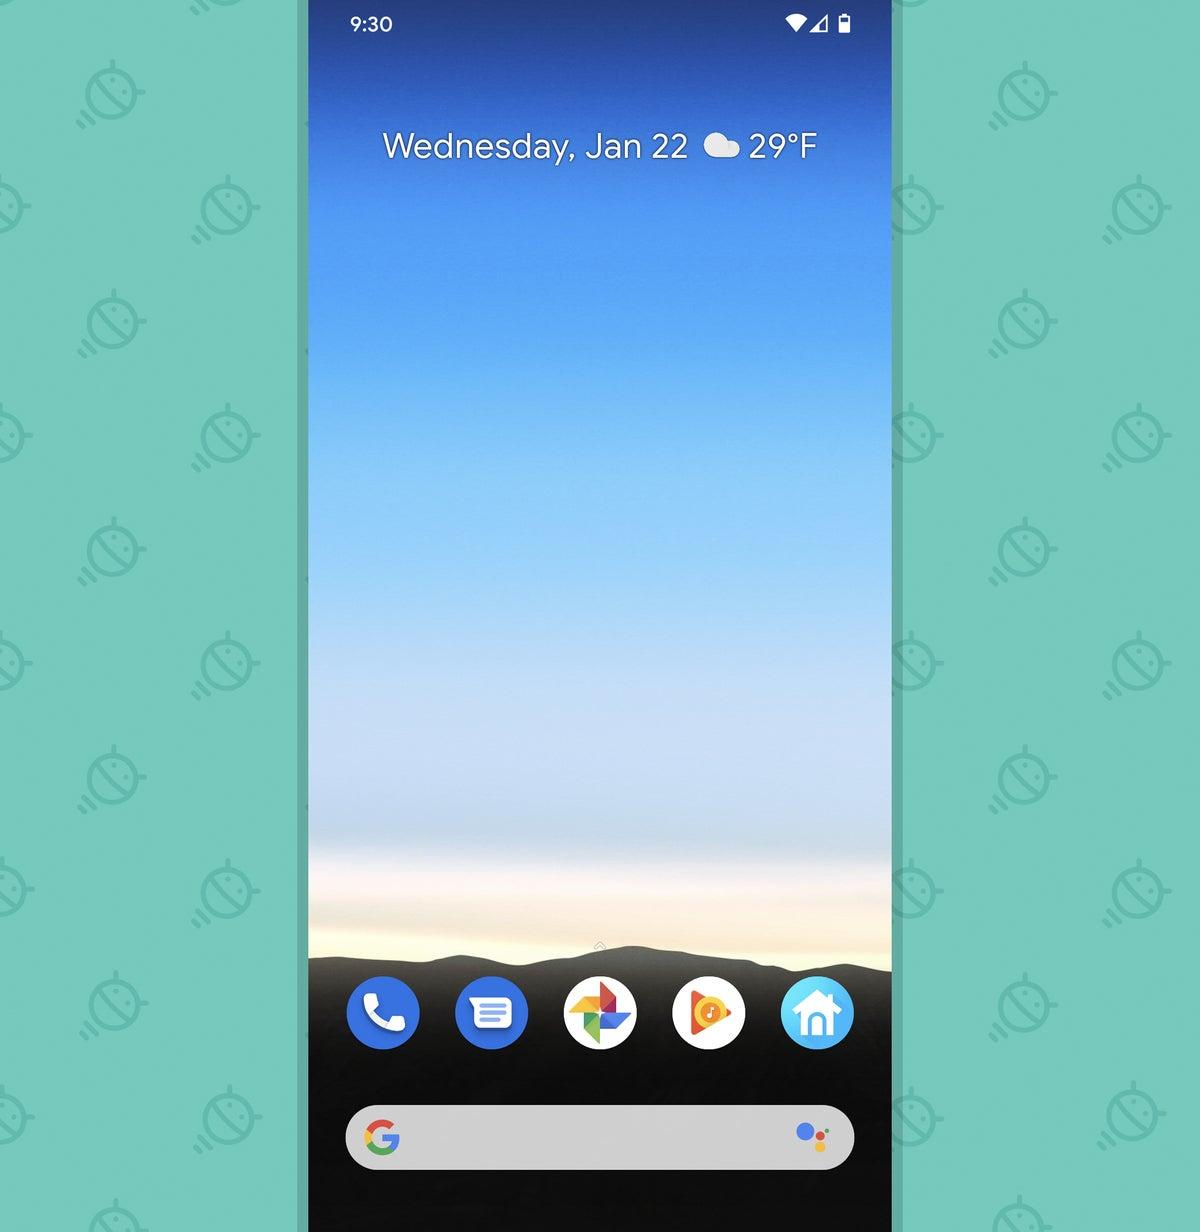 Optimización del teléfono Android: pantalla de inicio